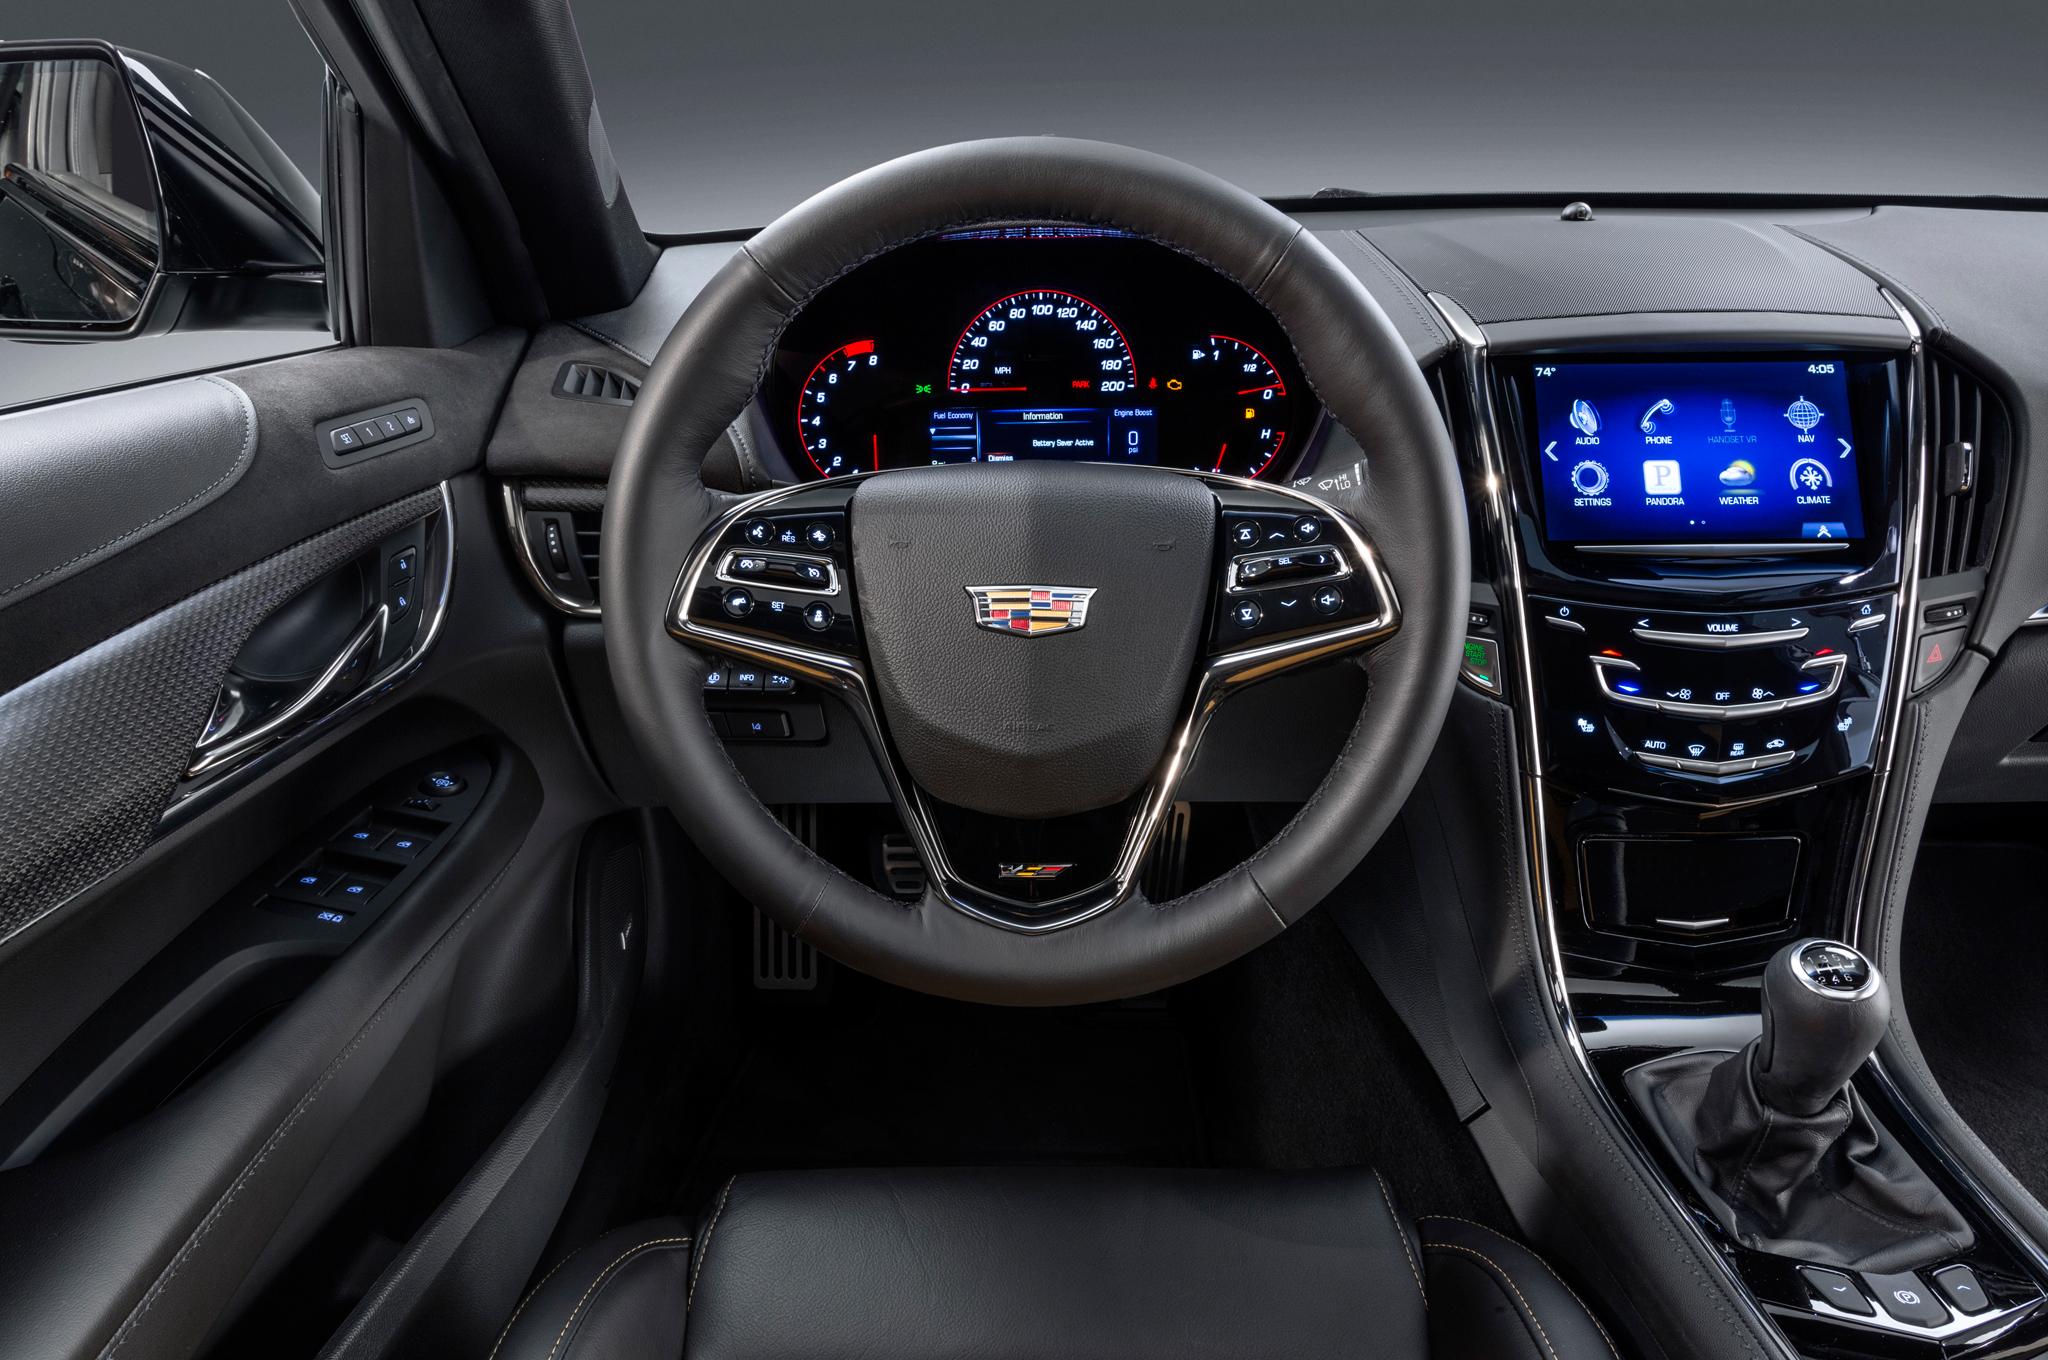 2016 Cadillac ATS-V Cockpit and Speedometer